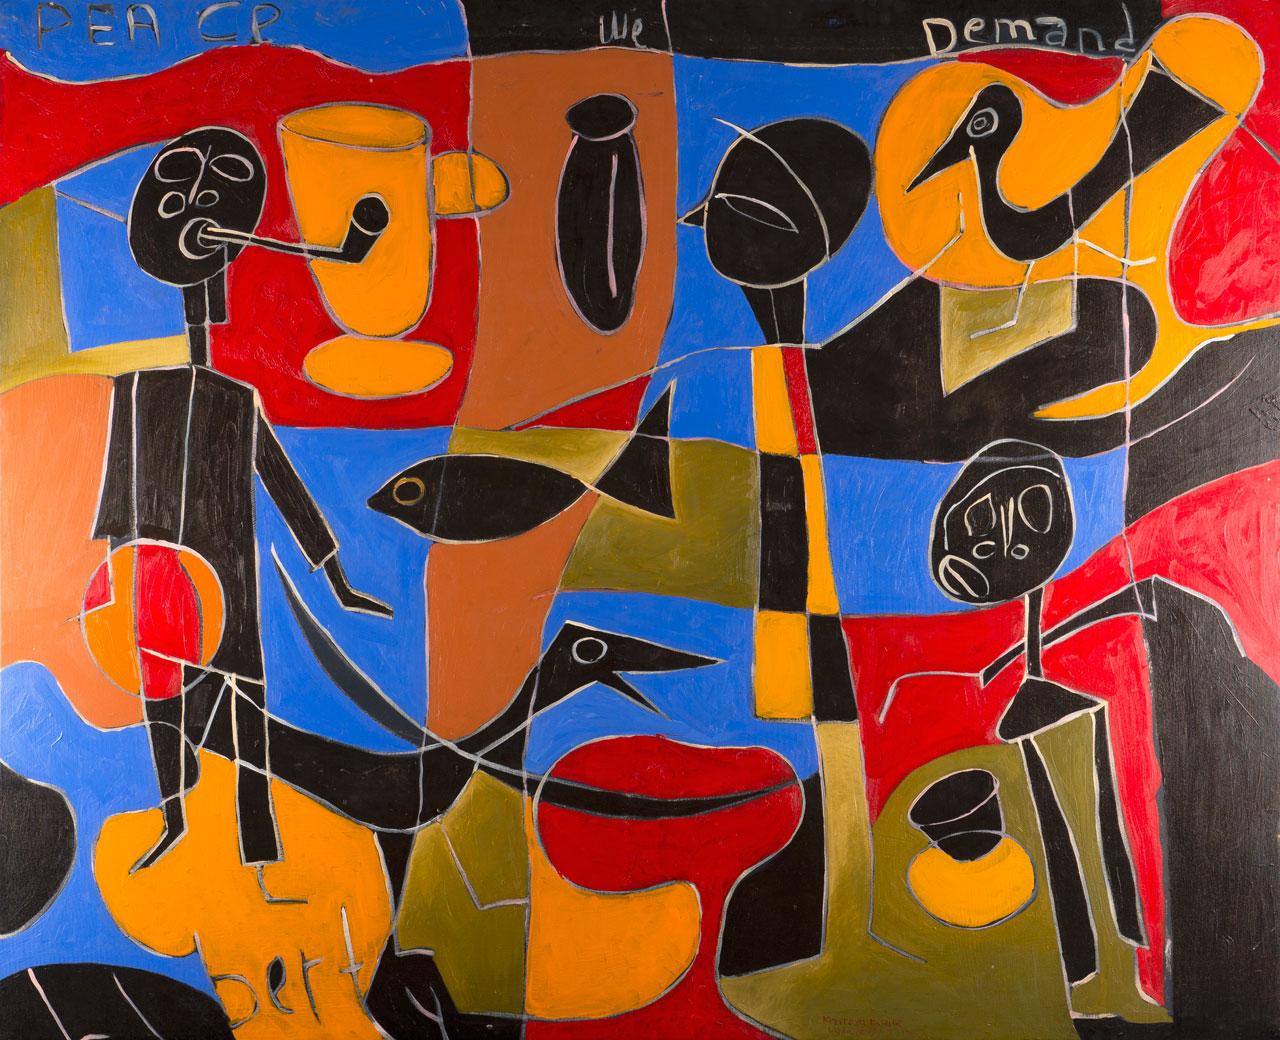 Kizito Maria Kasule (b.1973), The Legacy of Democracy,  2013, acrylic on canvas,143 x 175.5cm